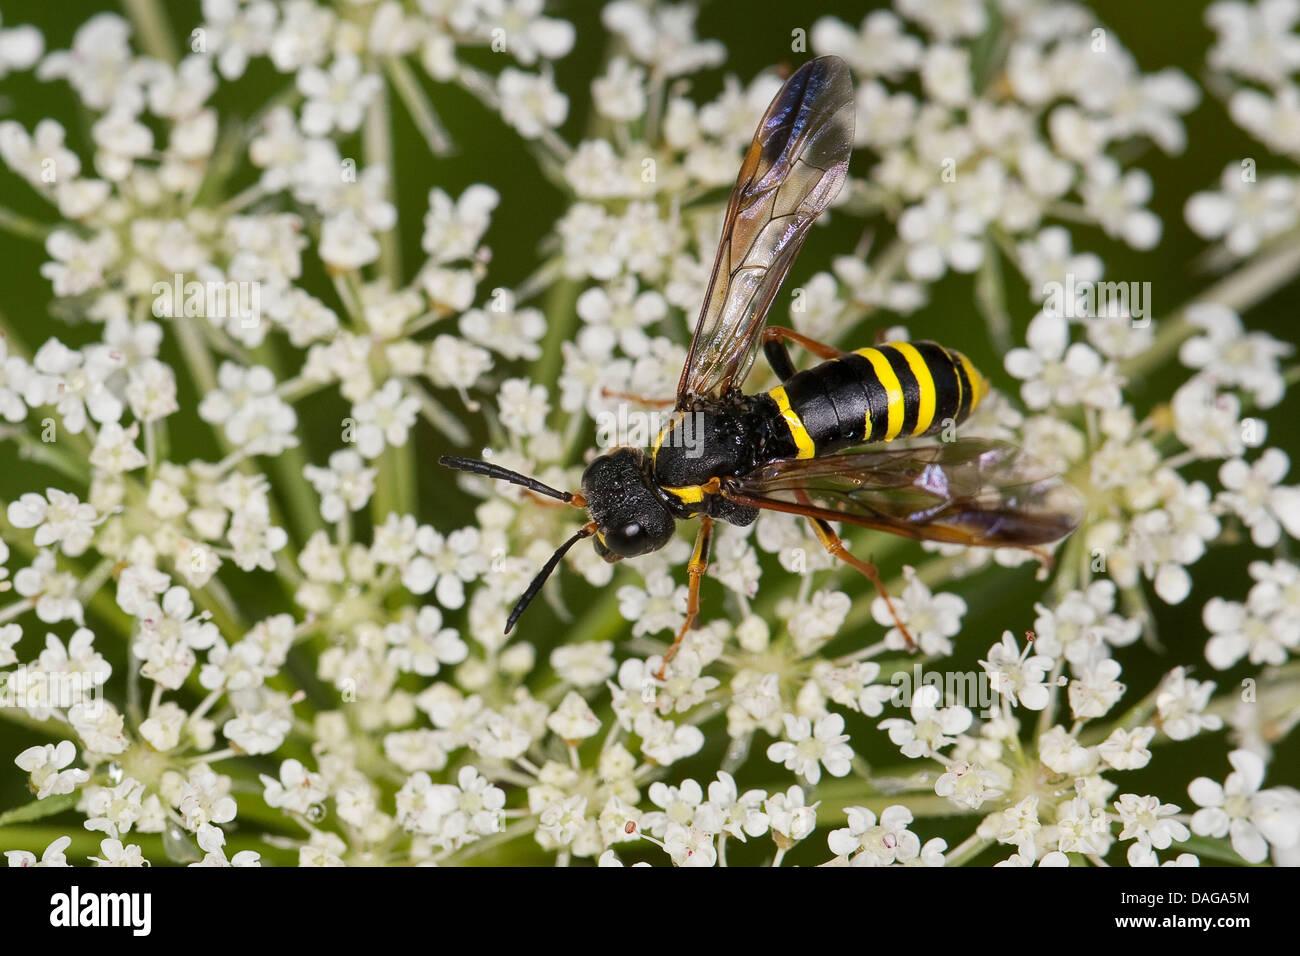 Sawfly, Saw-fly (Tenthredo vespa), female on a flower visit, Germany - Stock Image